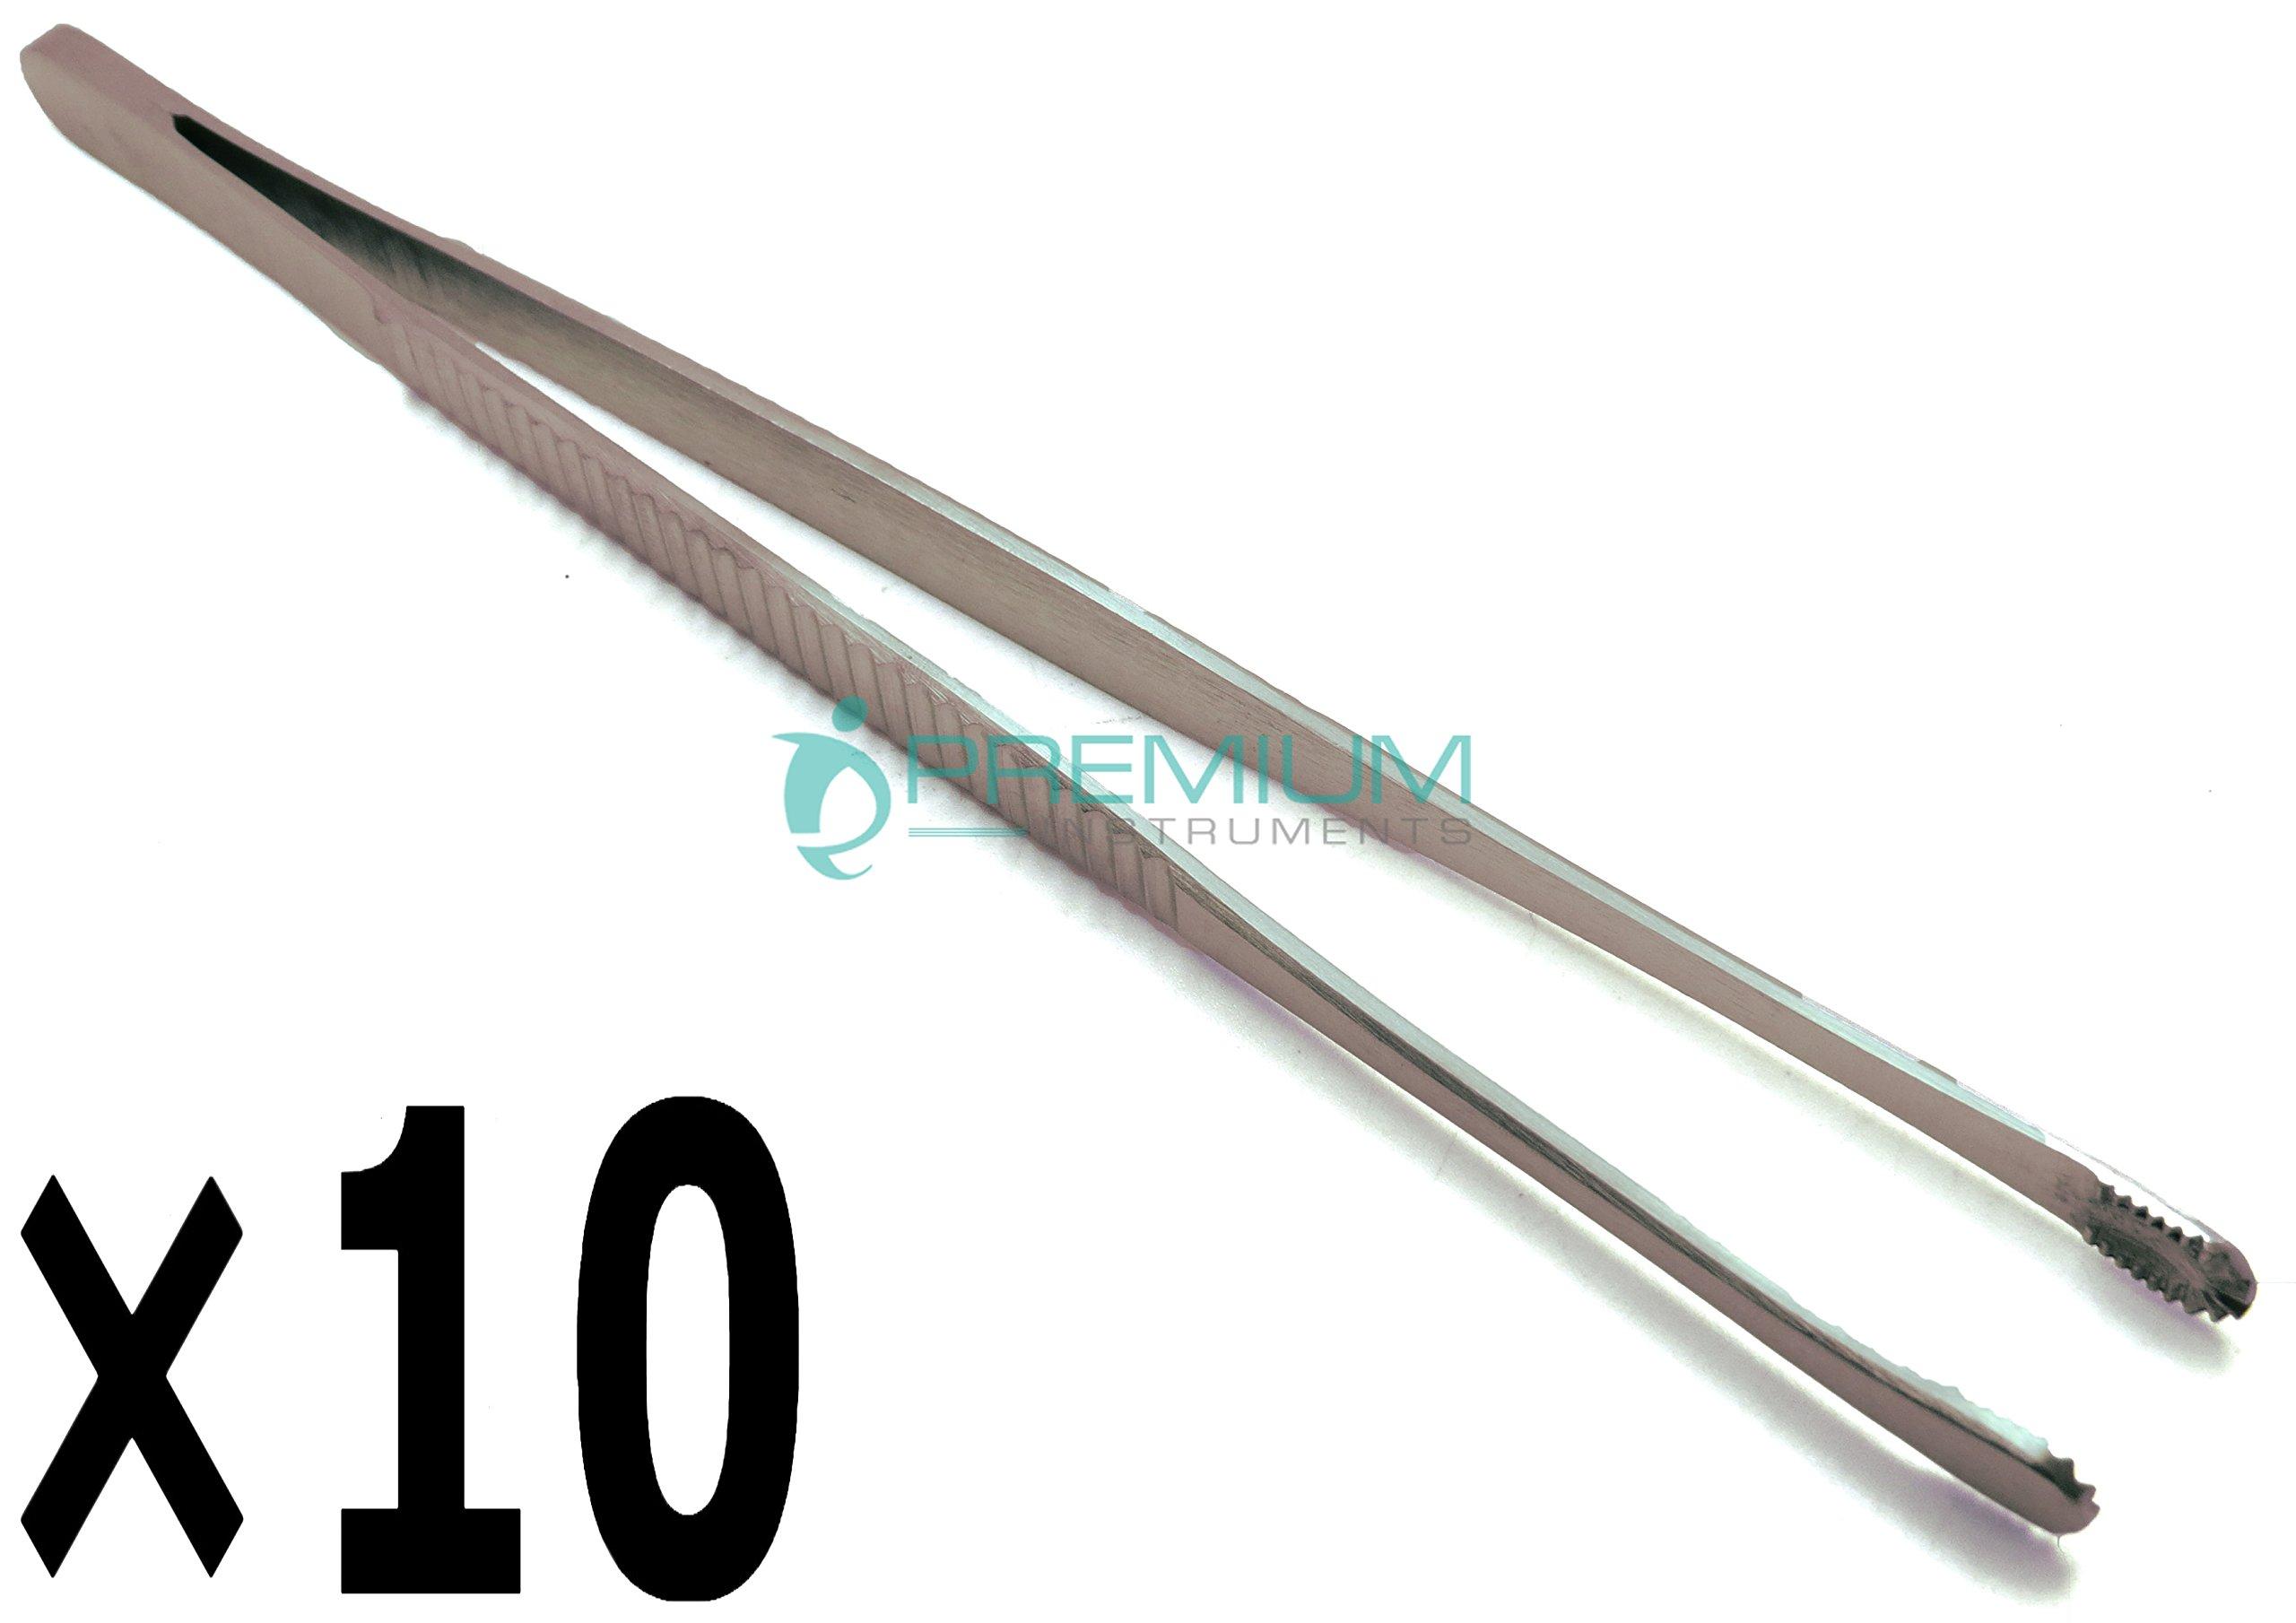 10× Dental Russian Tissue Forceps 8'' Surgical Premium Instruments